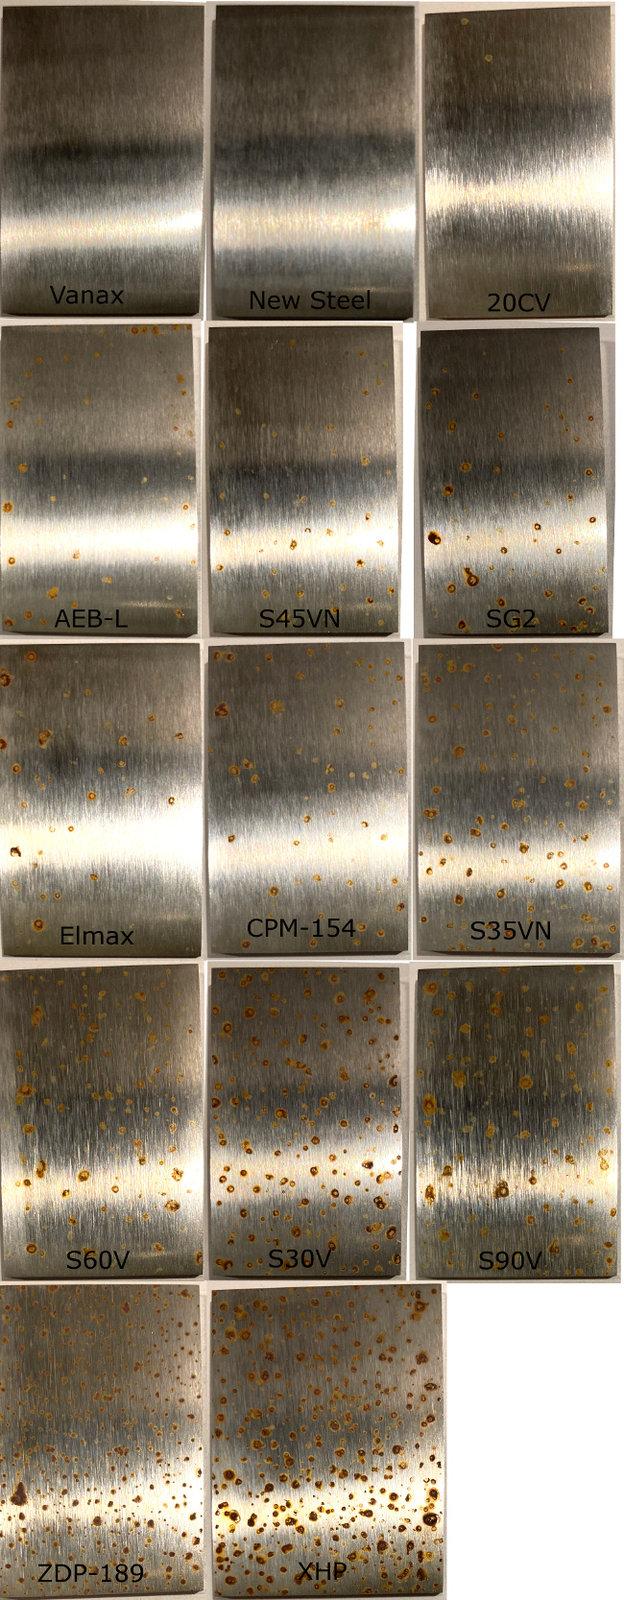 New-steel-72hrs-corrosion-summary-resized.jpeg